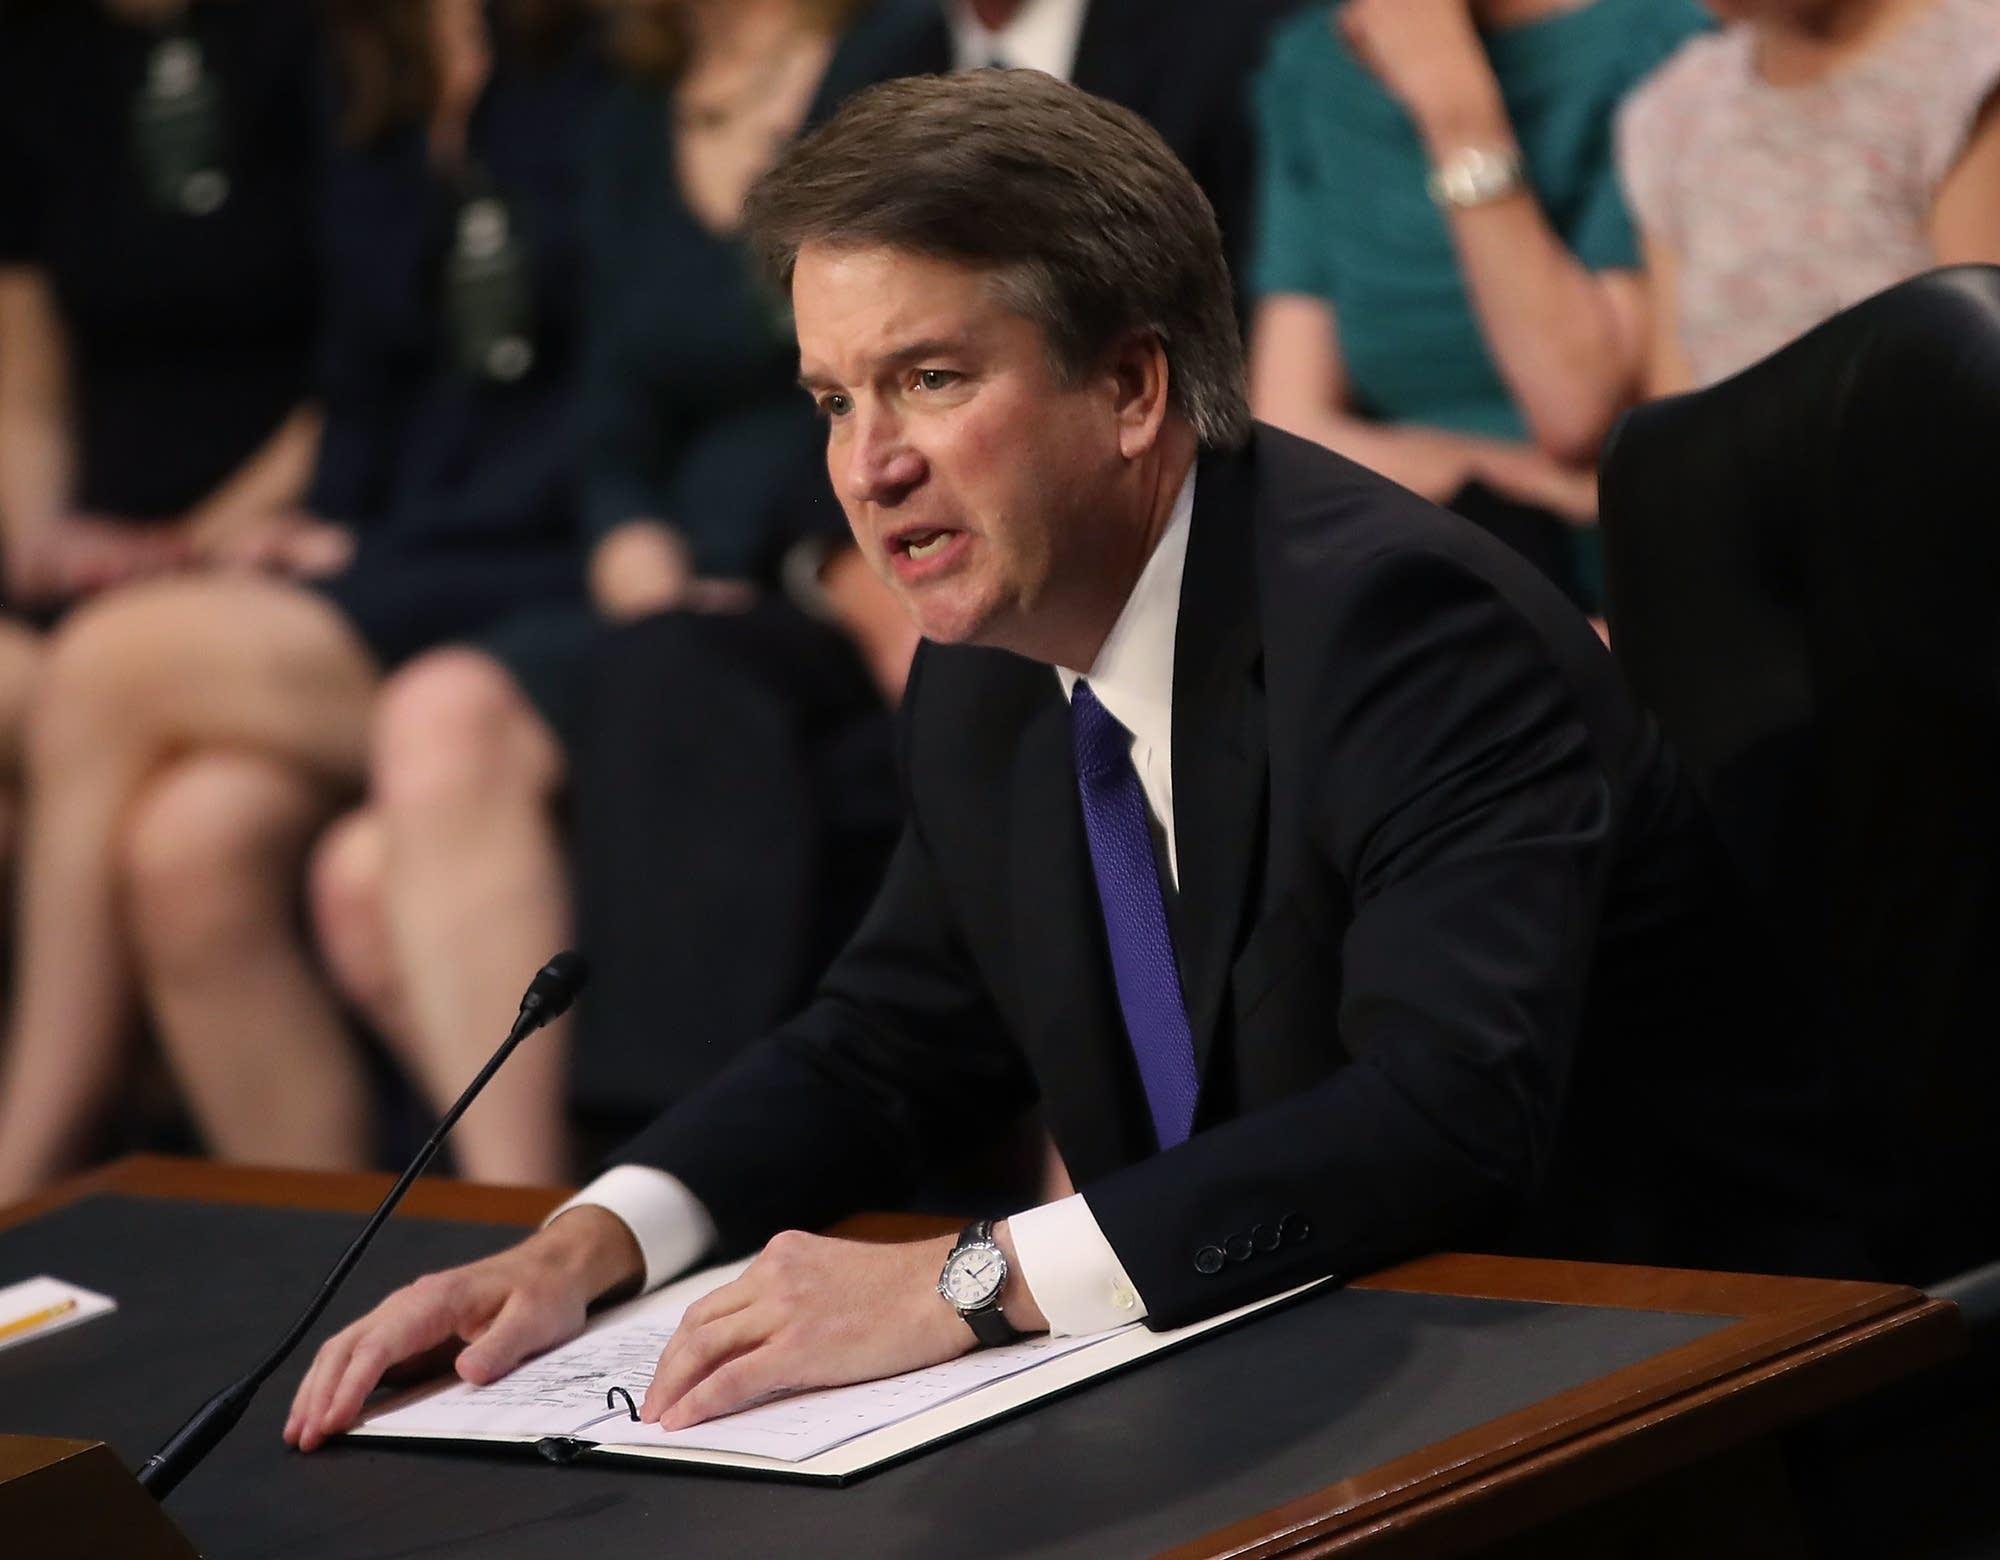 Supreme Court nominee Judge Brett Kavanaugh.